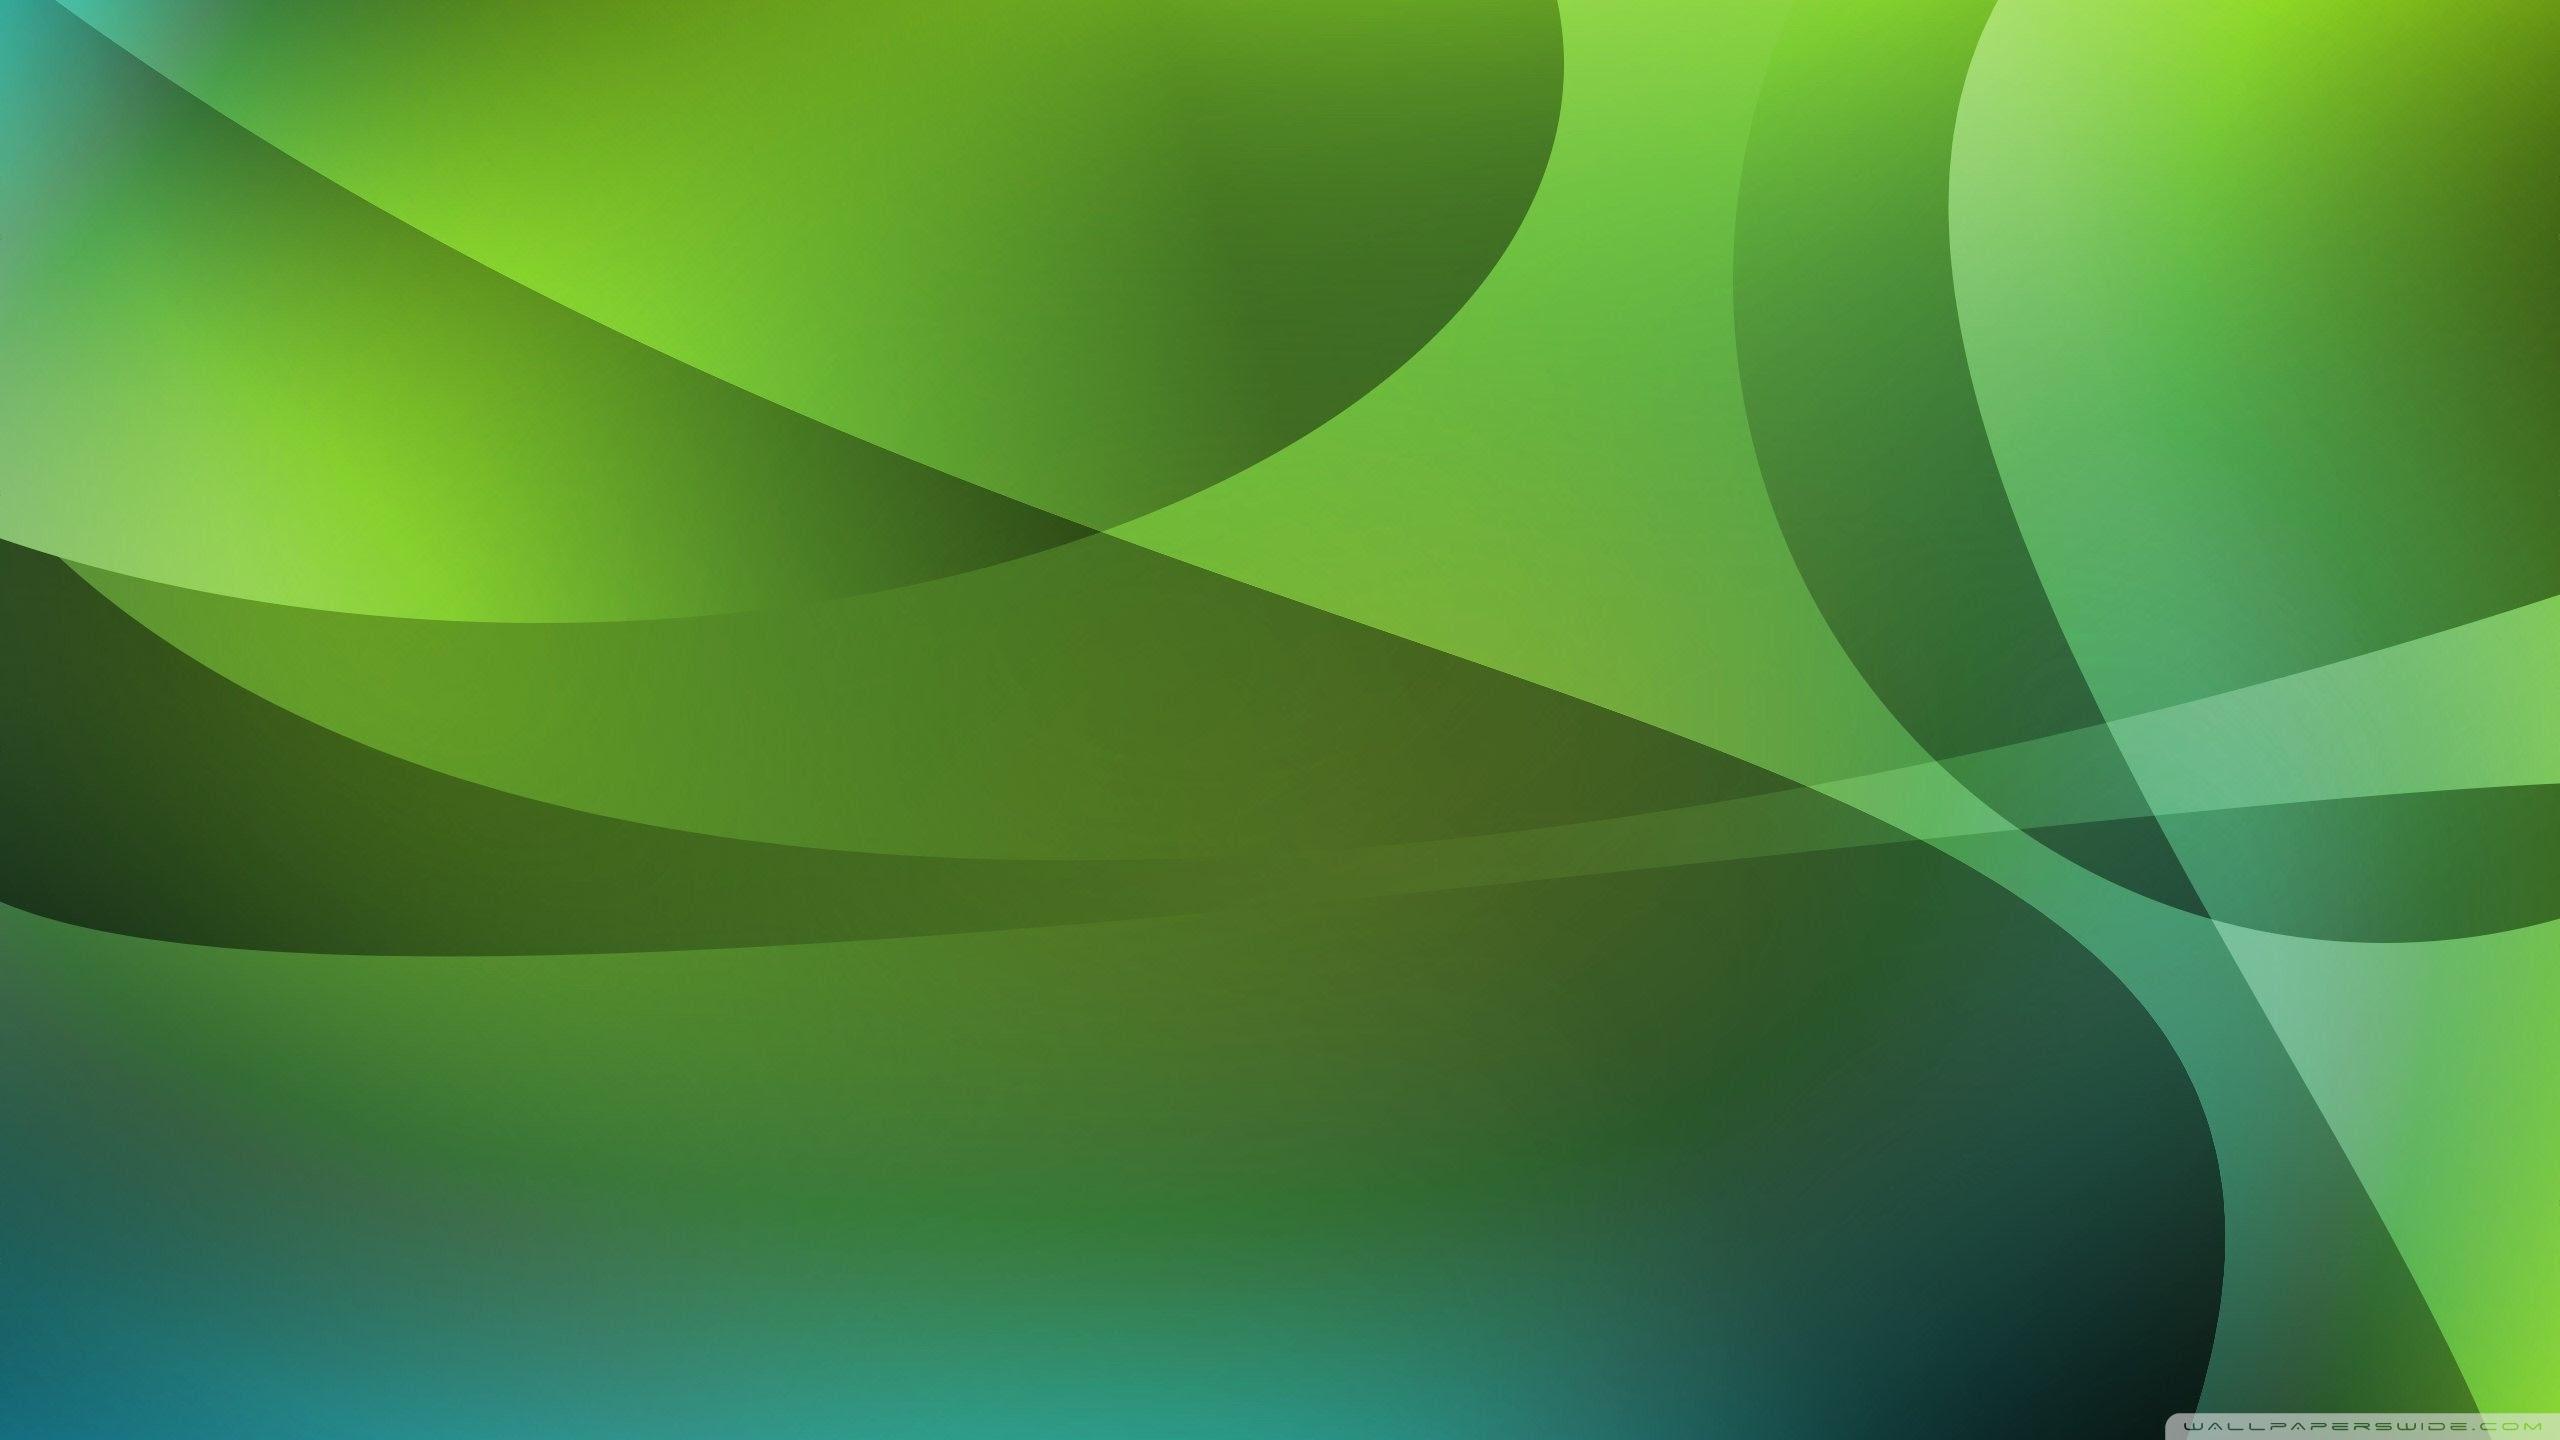 Unduh 71 Background Hijau Abstrak Hd Gratis